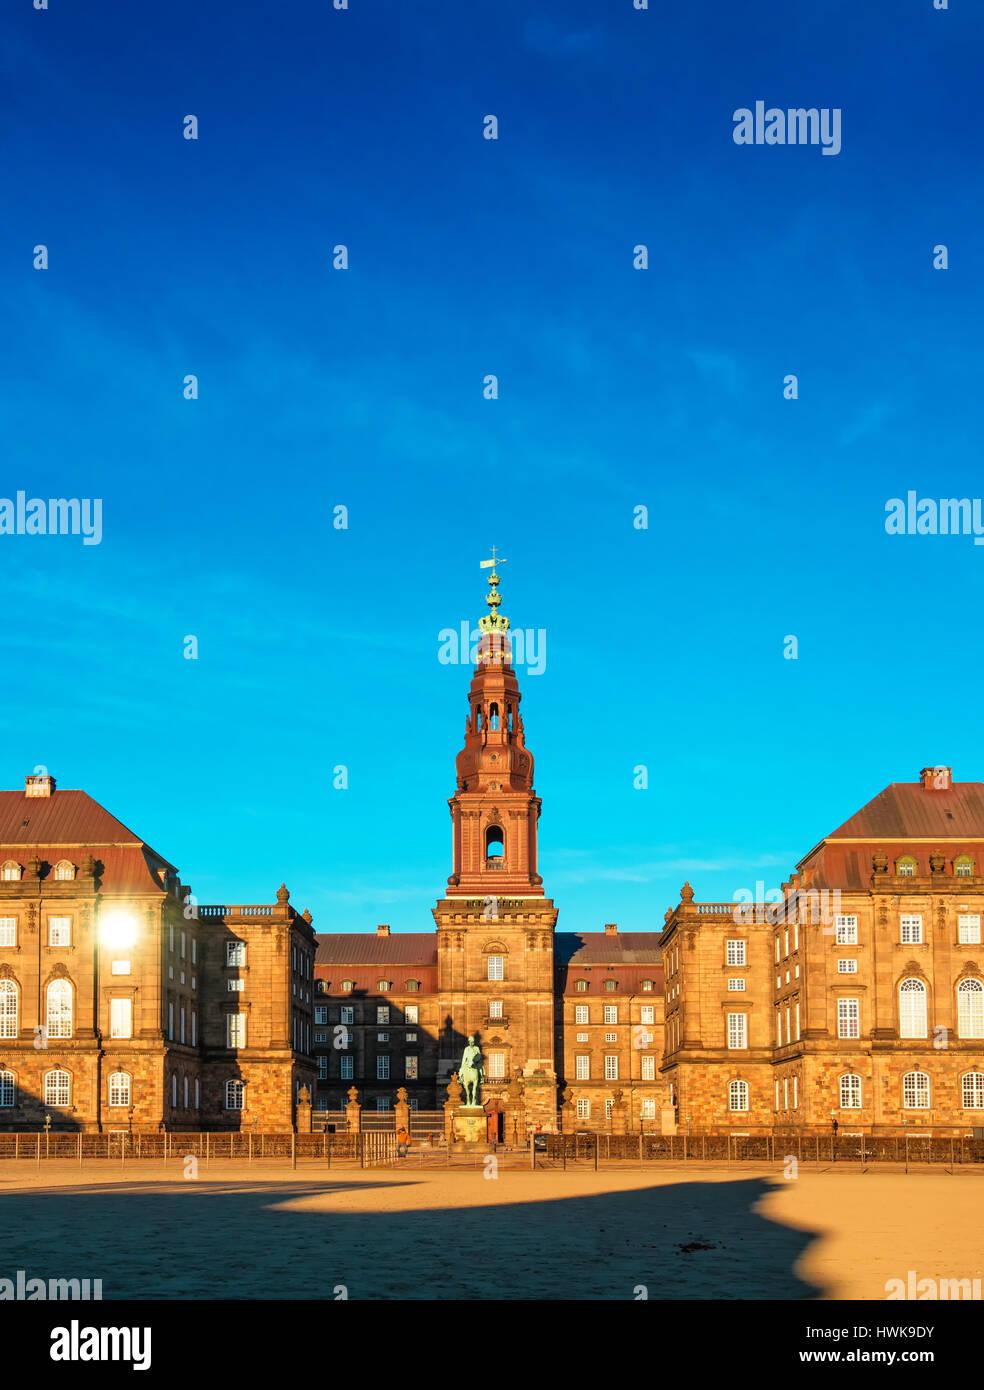 Copenhague, Dinamarca - 11 de marzo de 2017: Christiansborg Palace en Copenhague, Dinamarca, el edificio del parlamento danés. Foto de stock